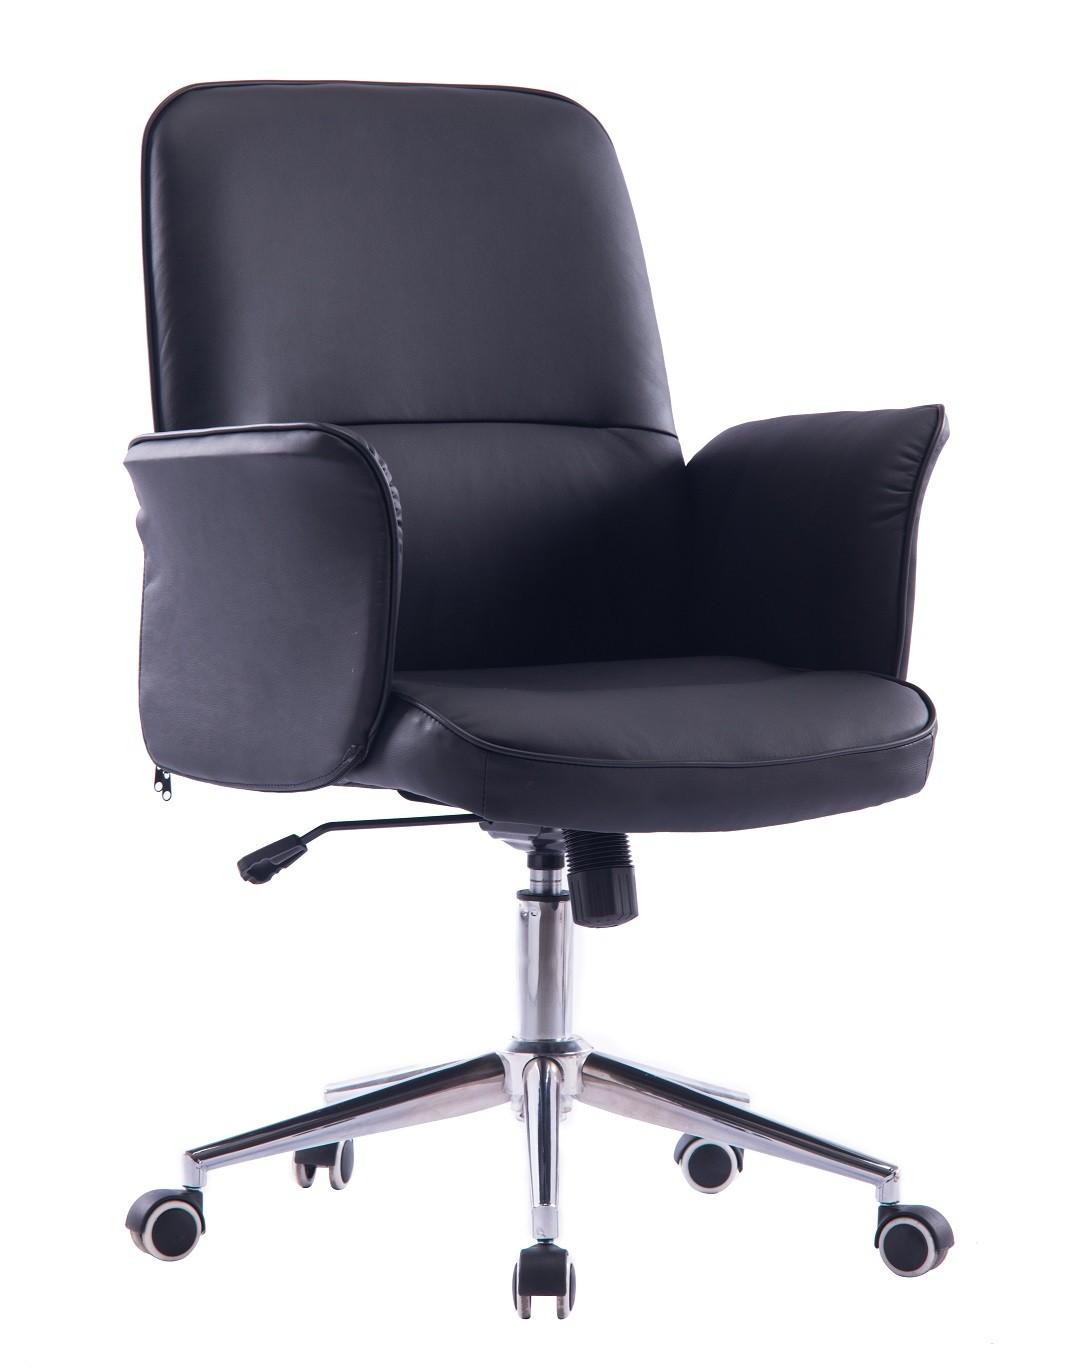 Office Armchair ANCONA, Gas, Tilt, Similpiel Black